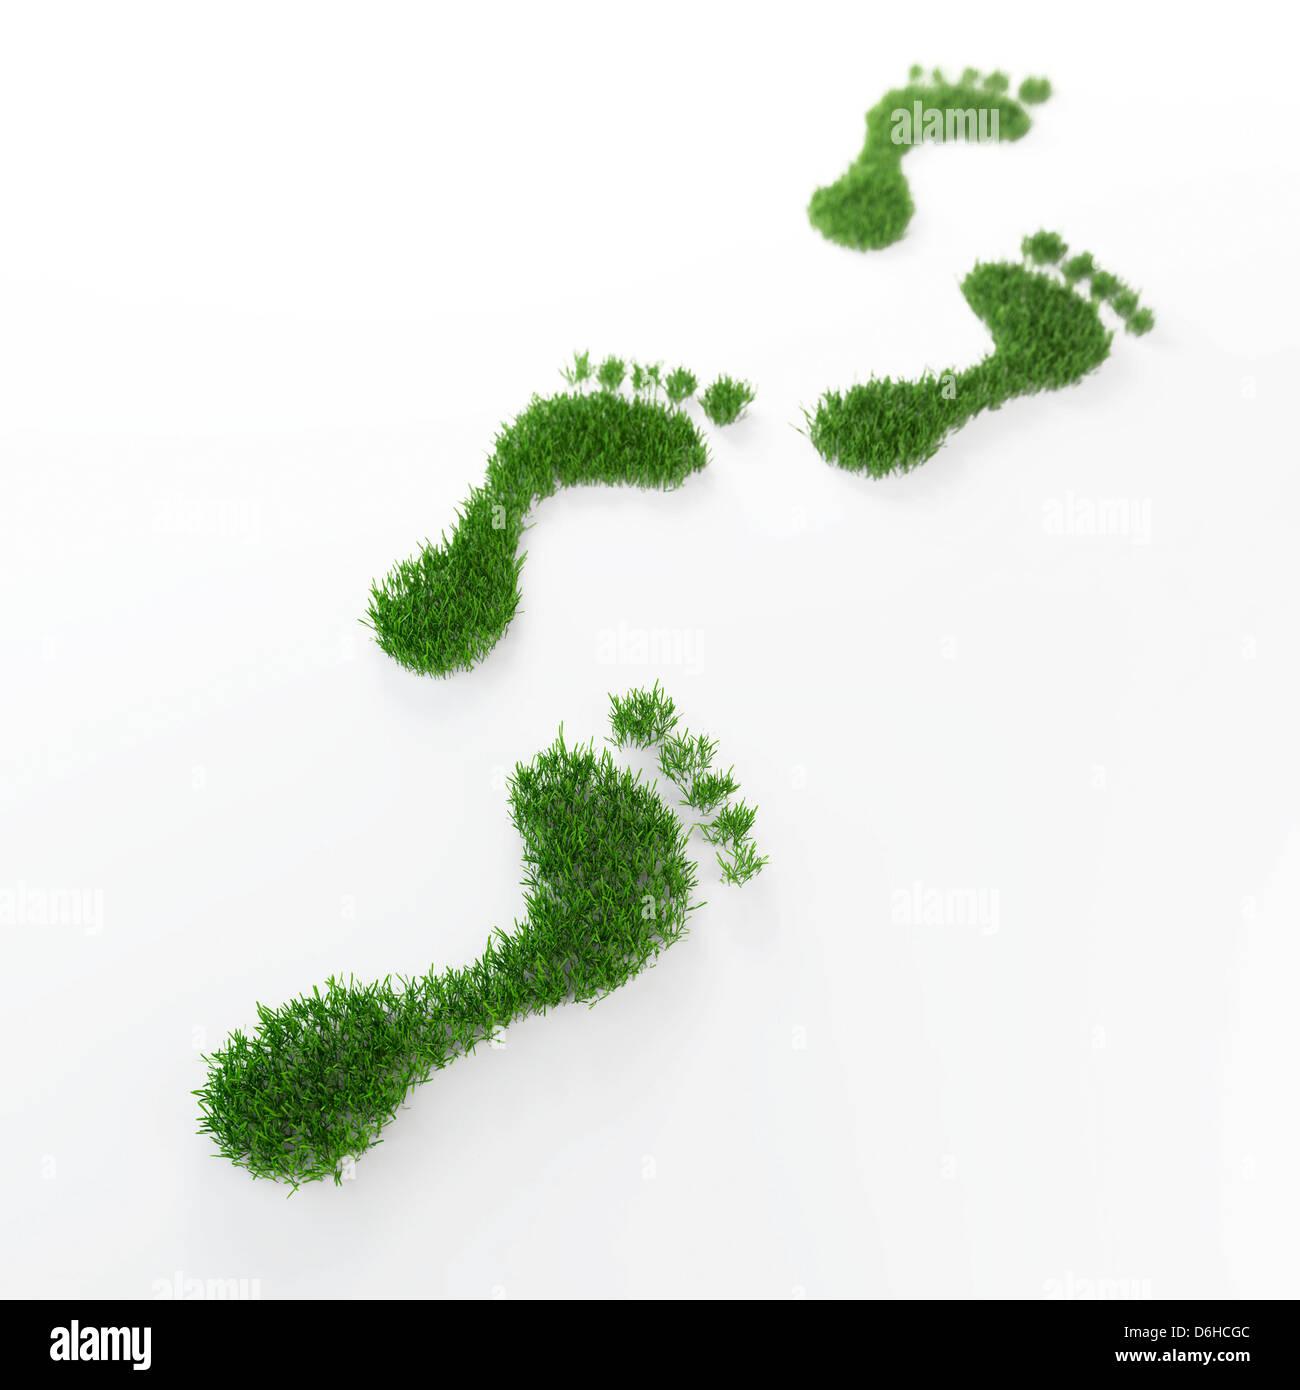 Huella ecológica, obra conceptual Imagen De Stock